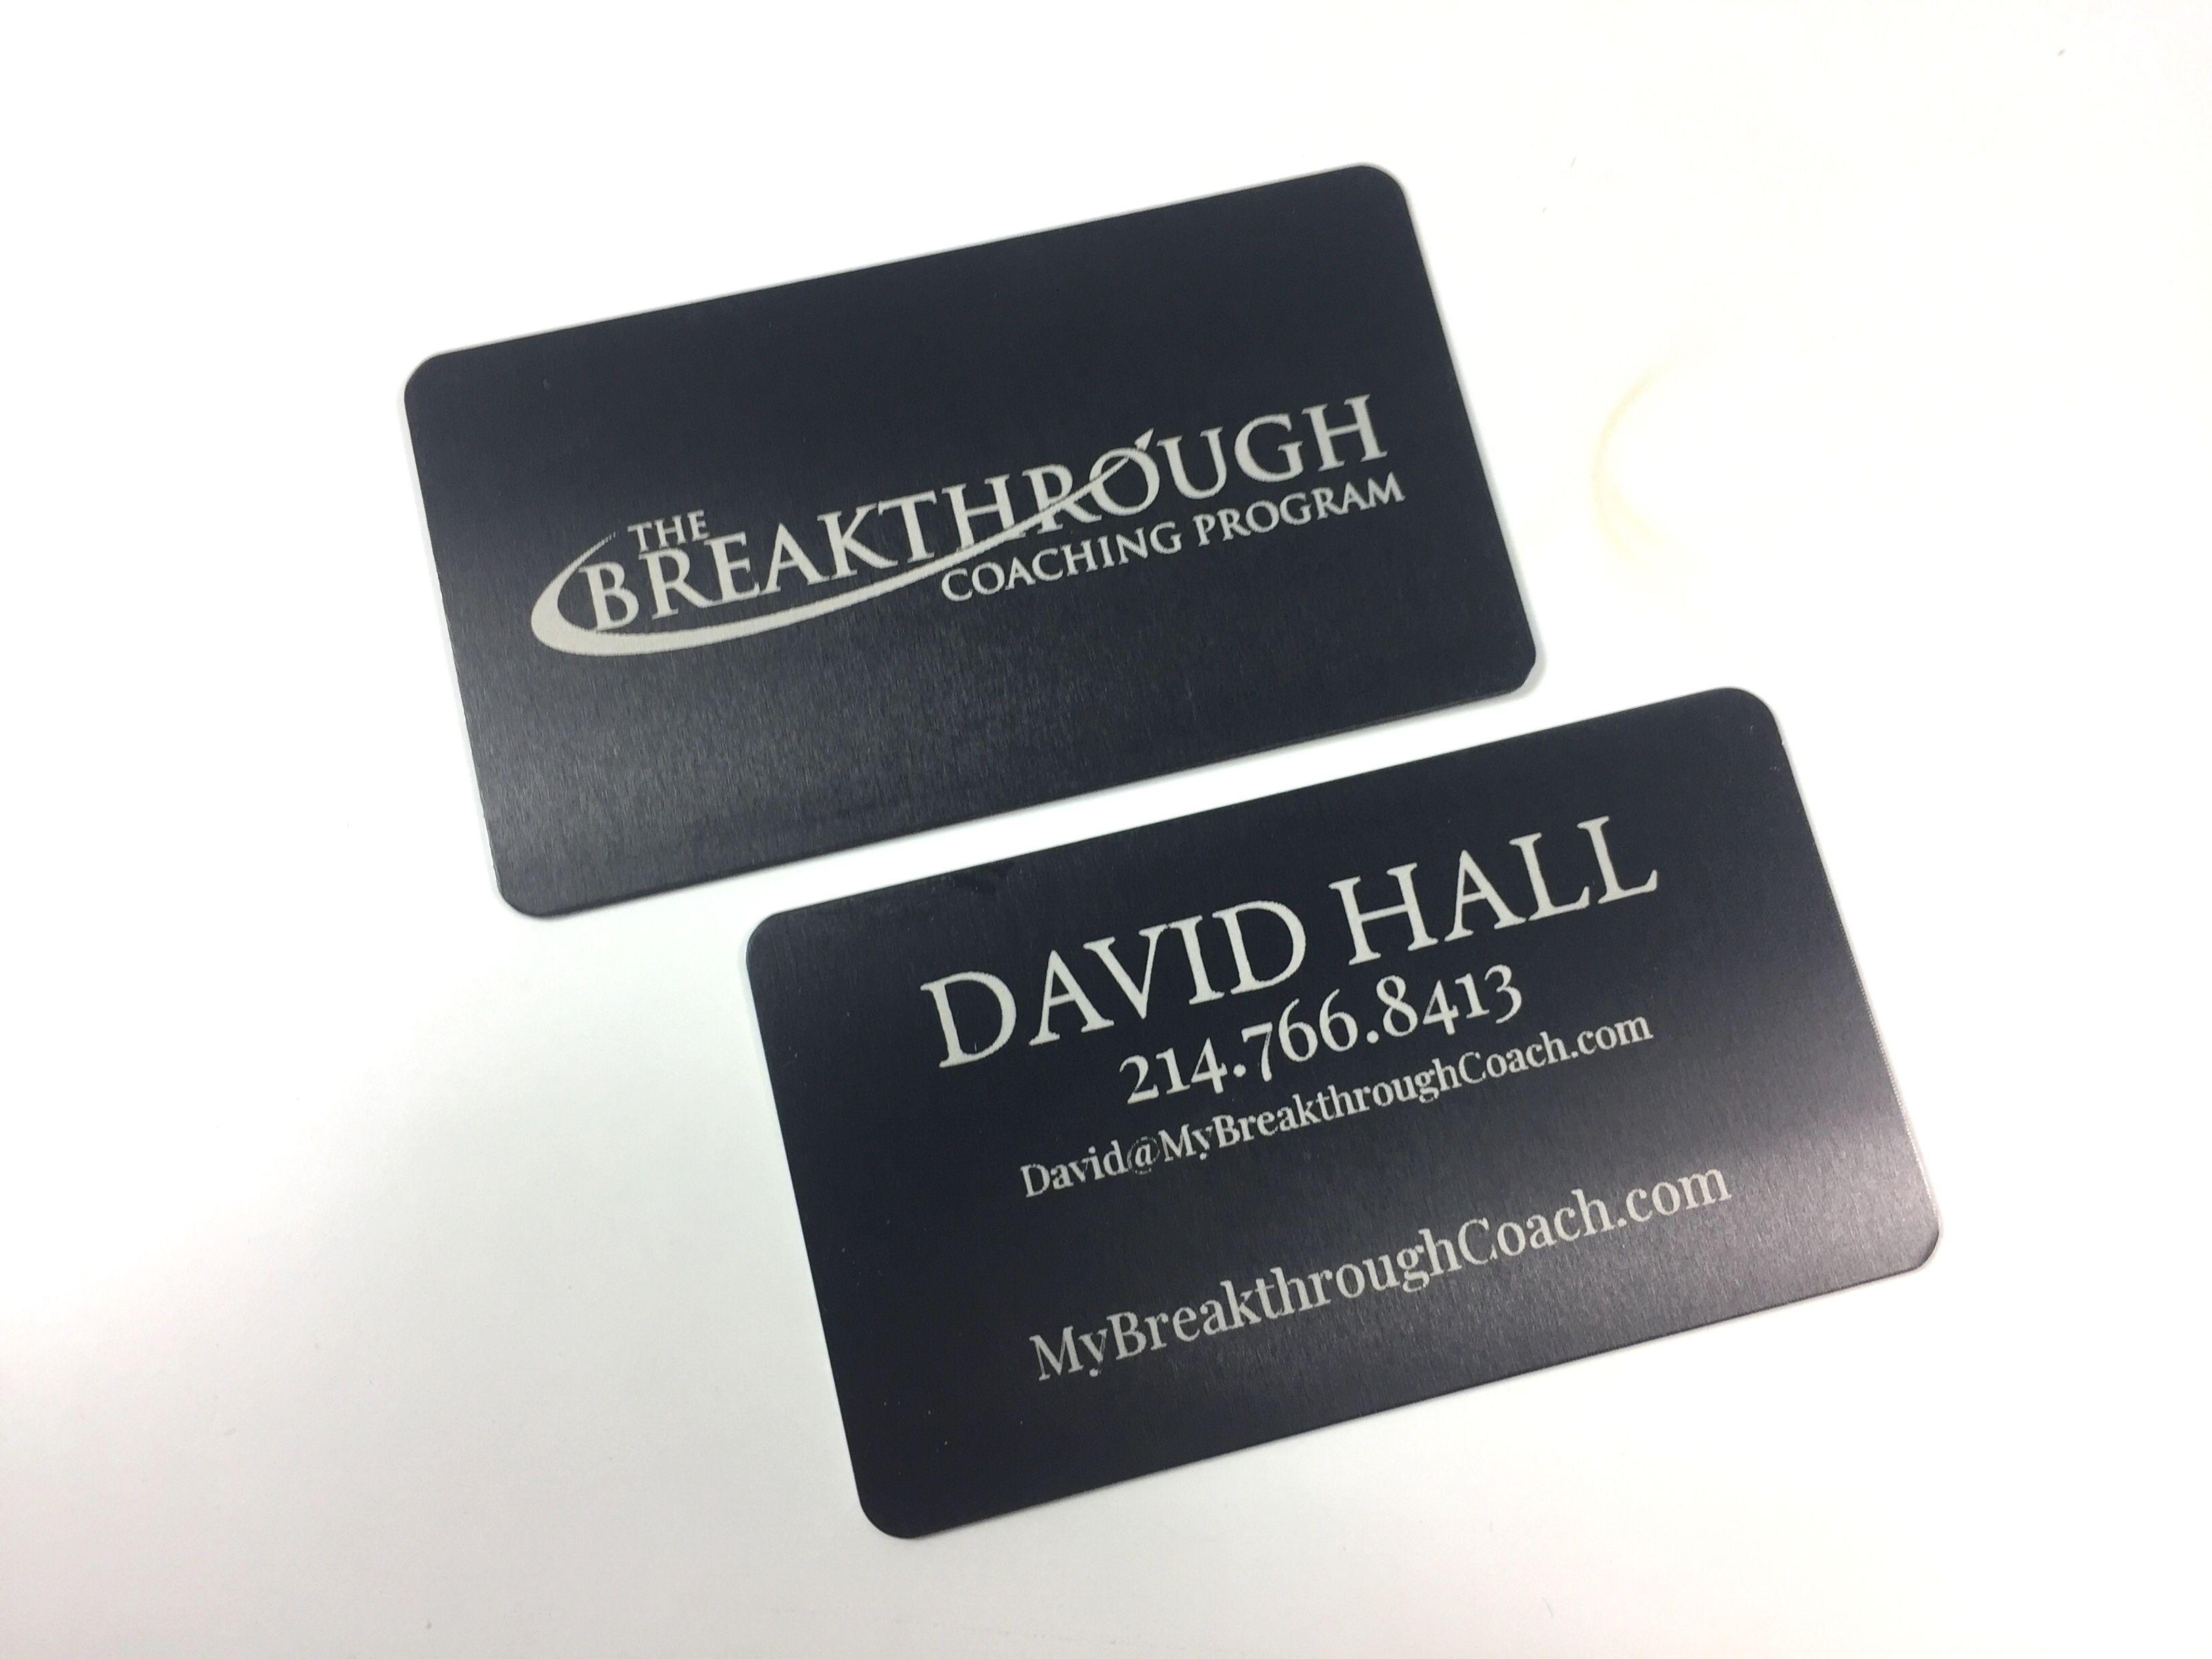 Black Metal Business Card Metal Business Cards Business Cards Creative Laser Engraved Business Cards